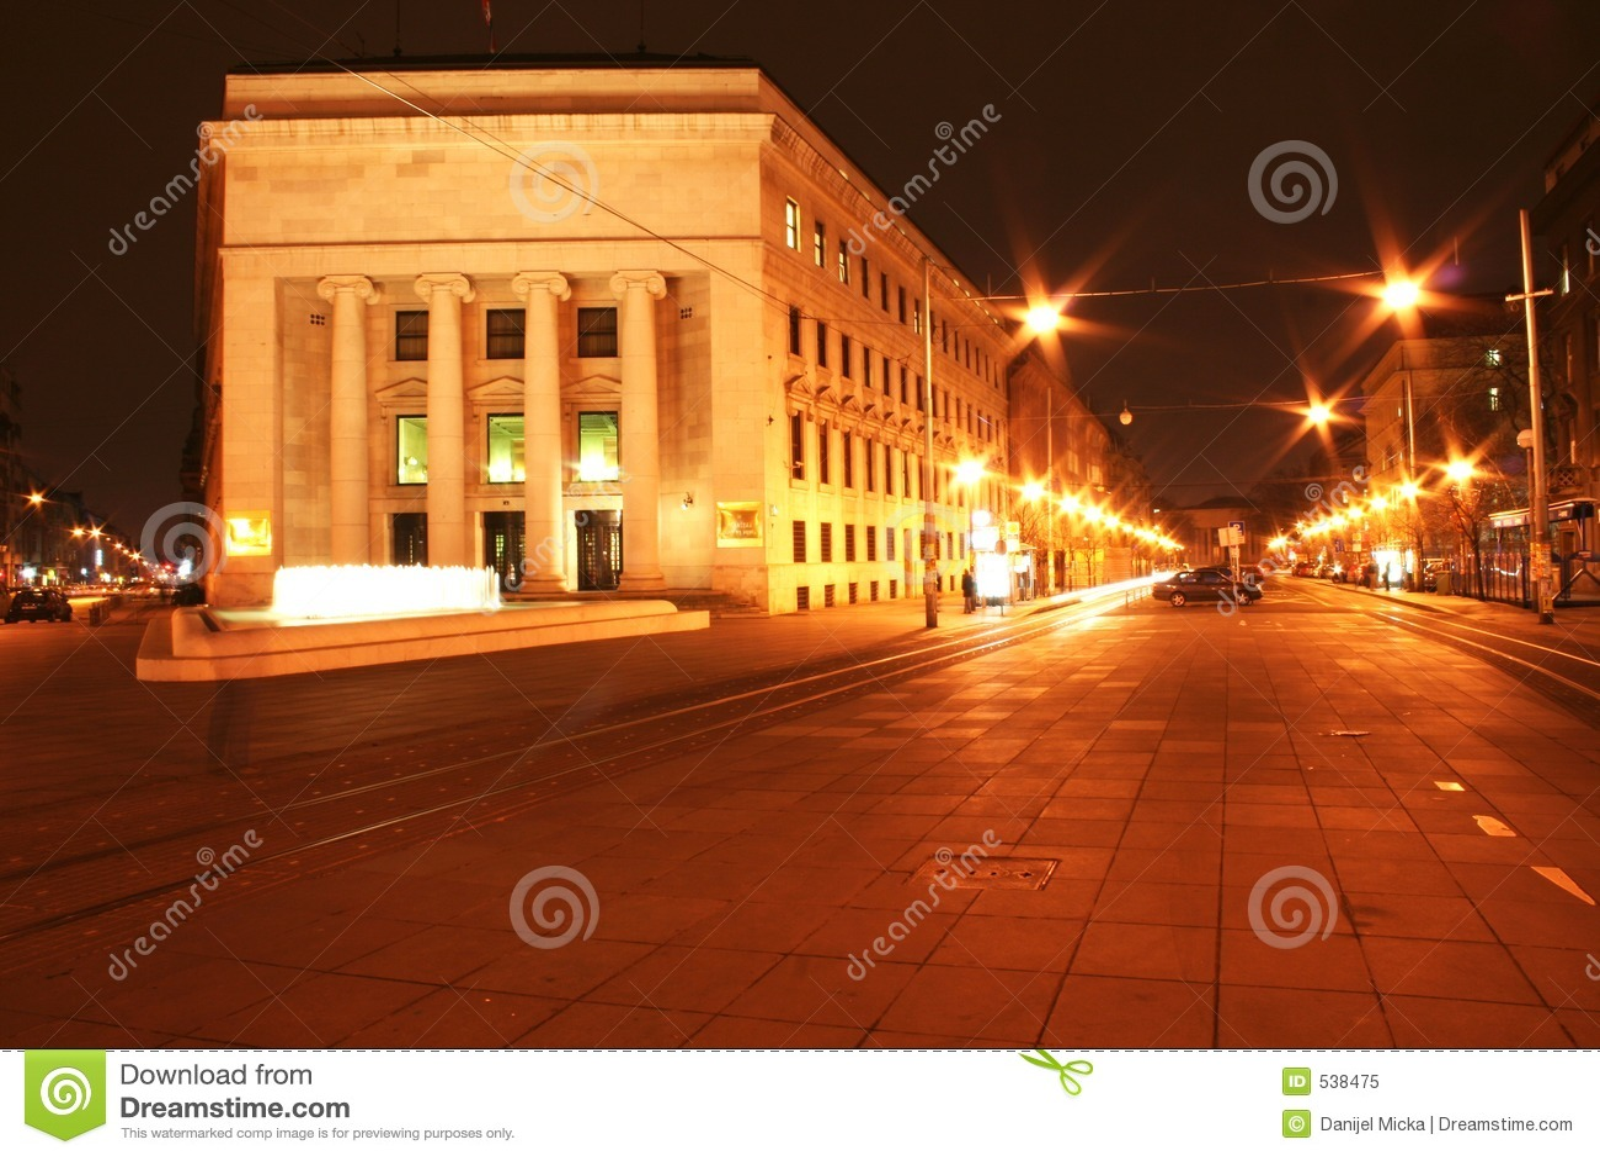 Download 城市晚上 库存图片. 图片 包括有 布琼布拉, 街道, 横向, 正方形, 都市风景, 室外, 拱道, 城市, 喷泉 - 538475